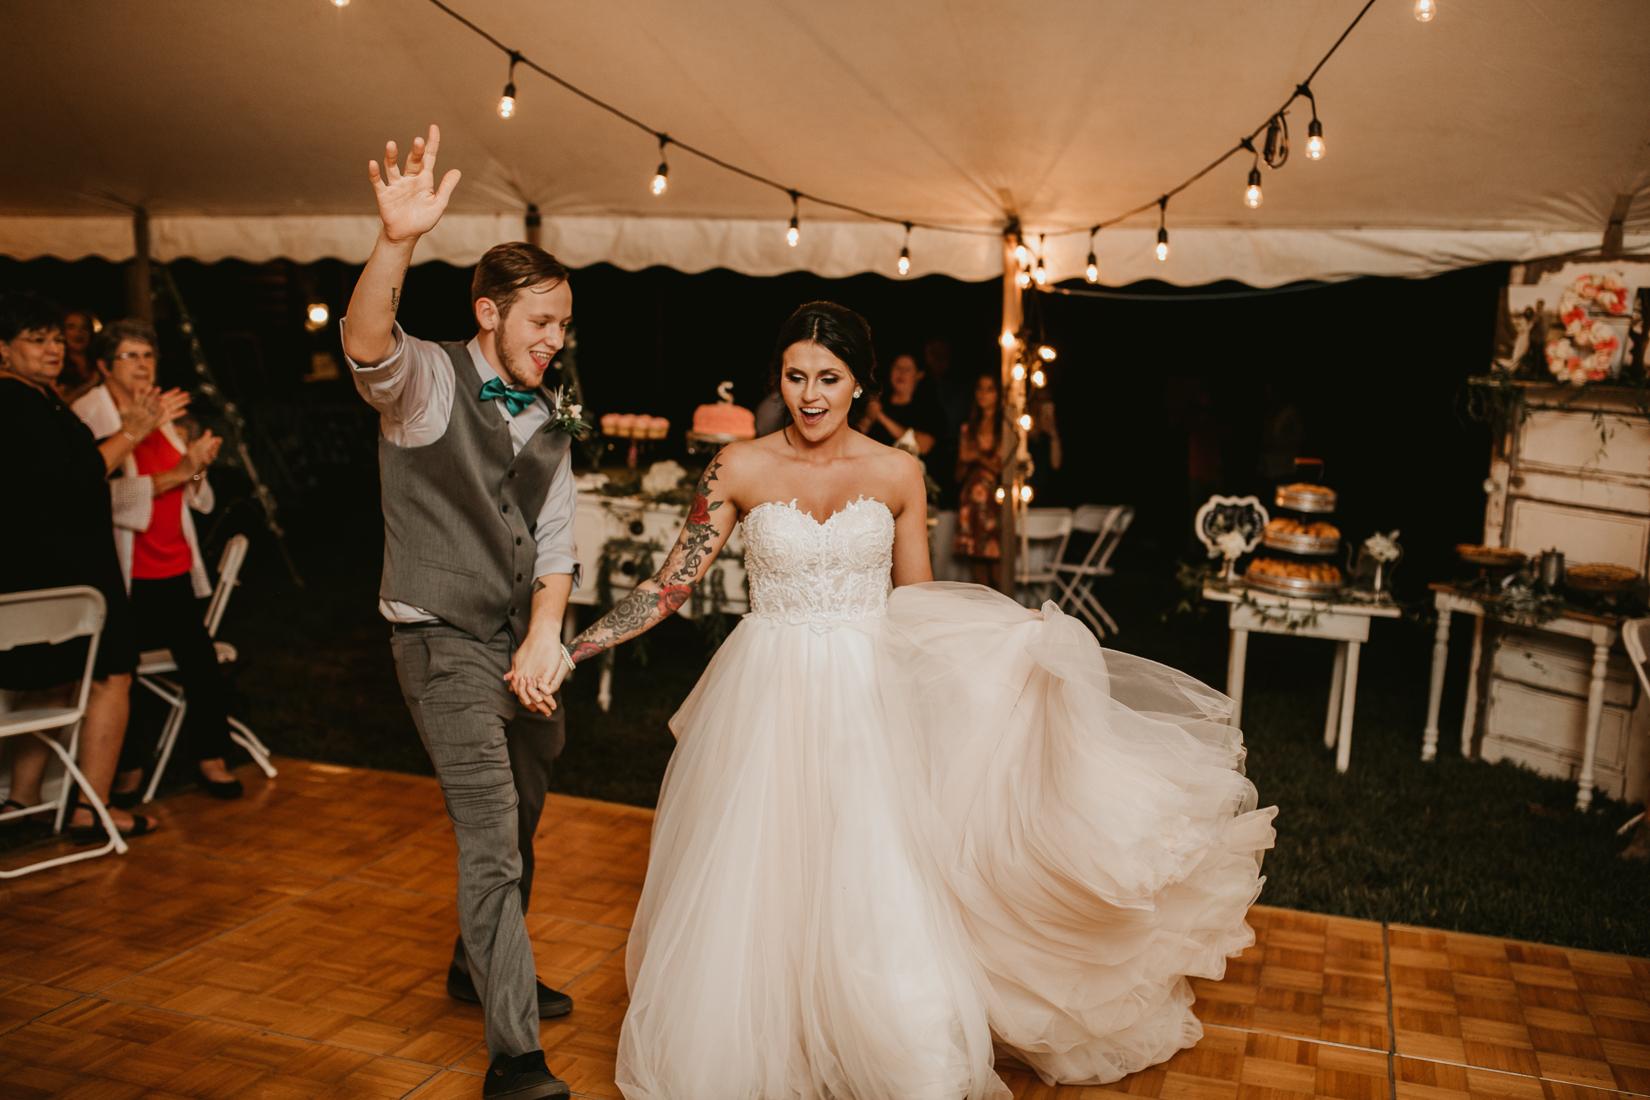 olivia_zay_wedding_09_2018-8952.jpg